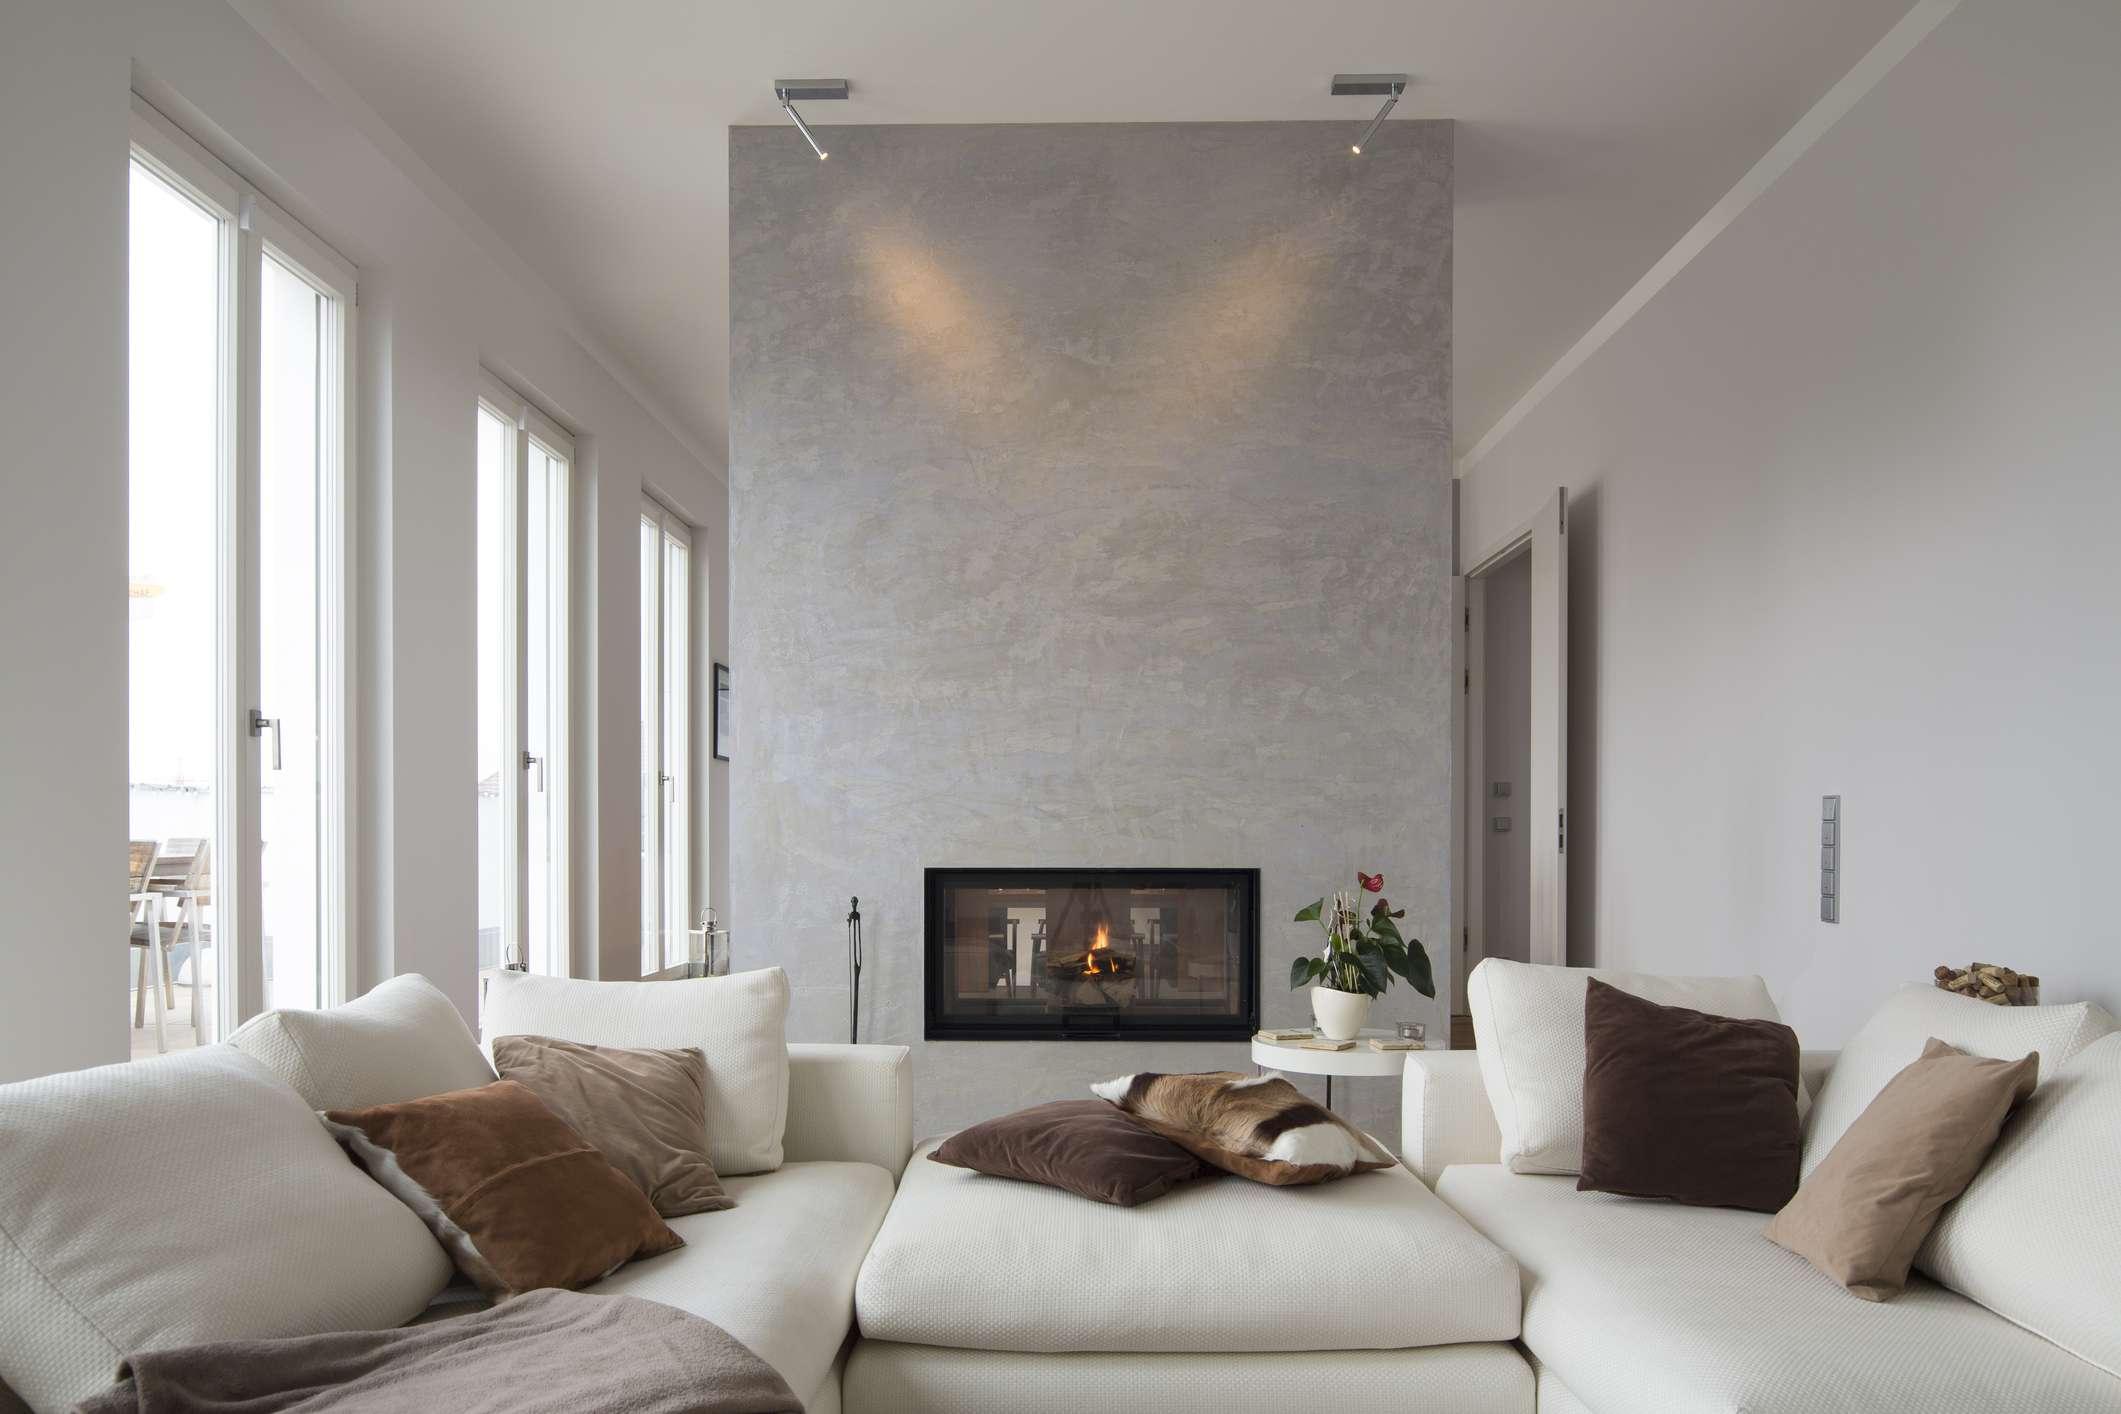 Minimalist double-sided fireplace